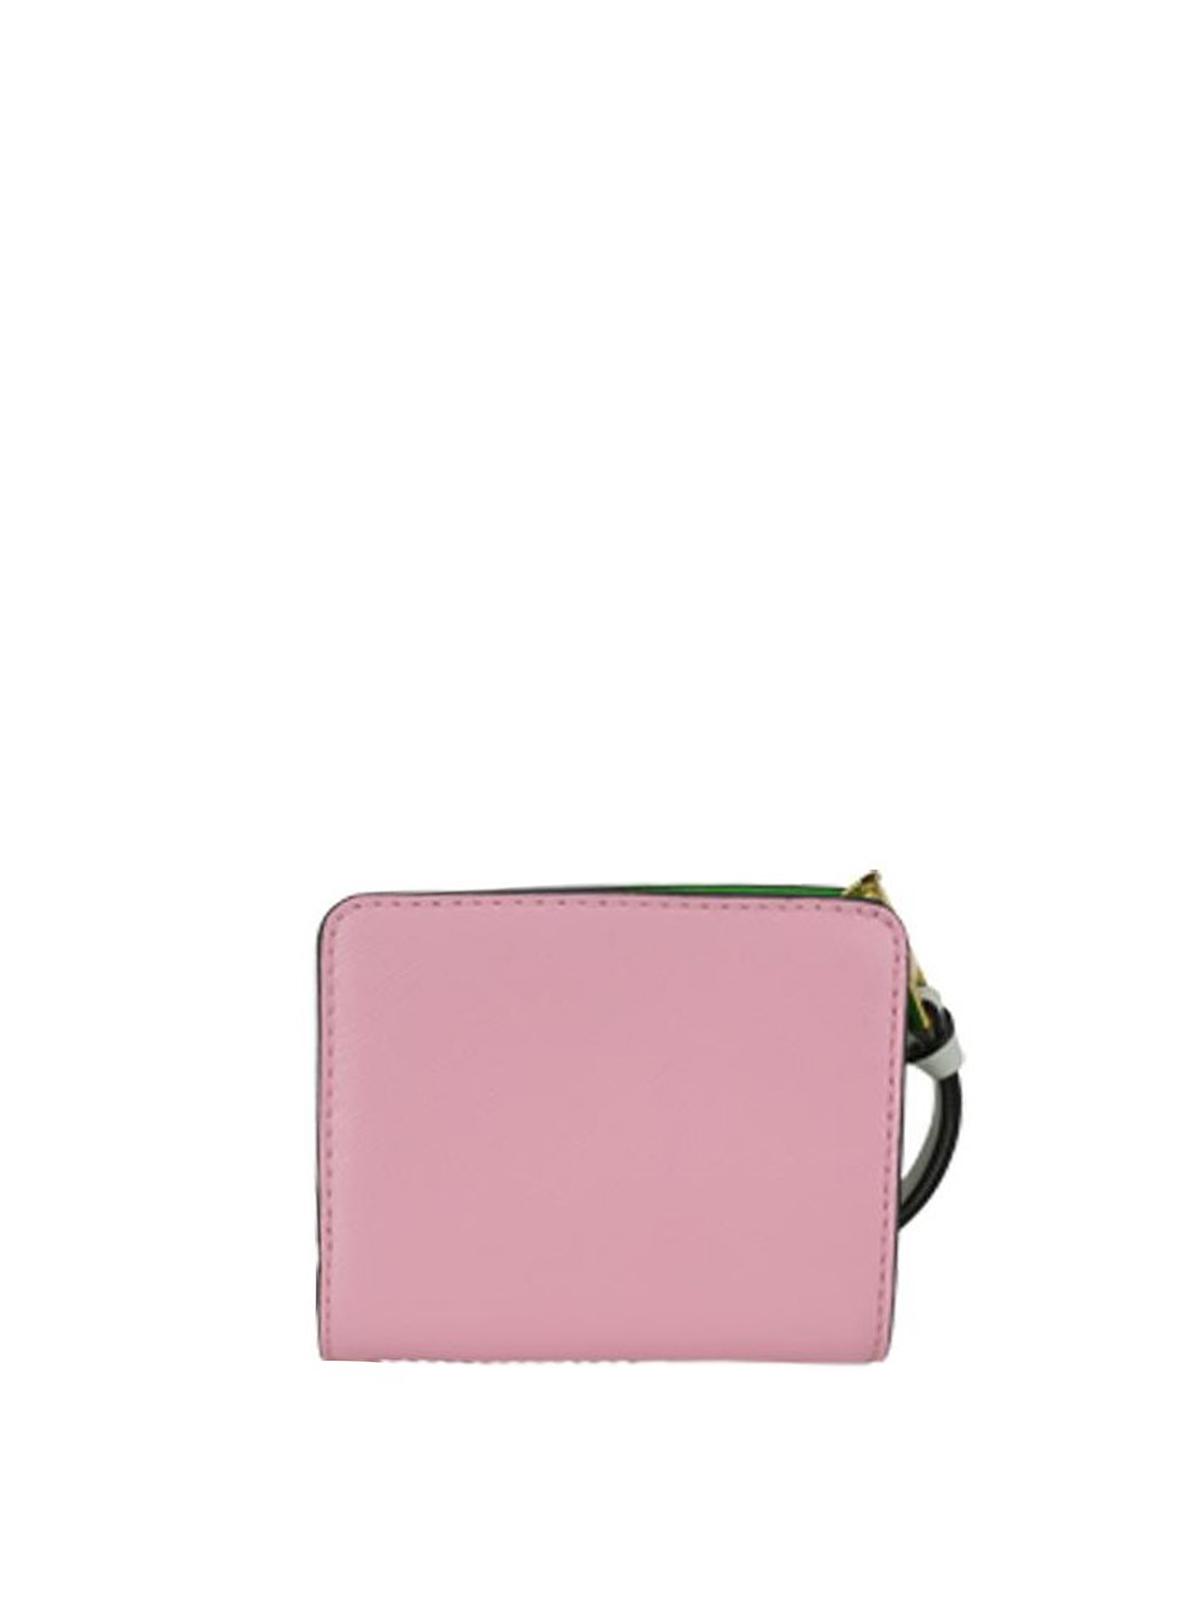 40455d1a54 iKRIX MARC JACOBS: wallets & purses - Snapshot Mini compact zipped wallet